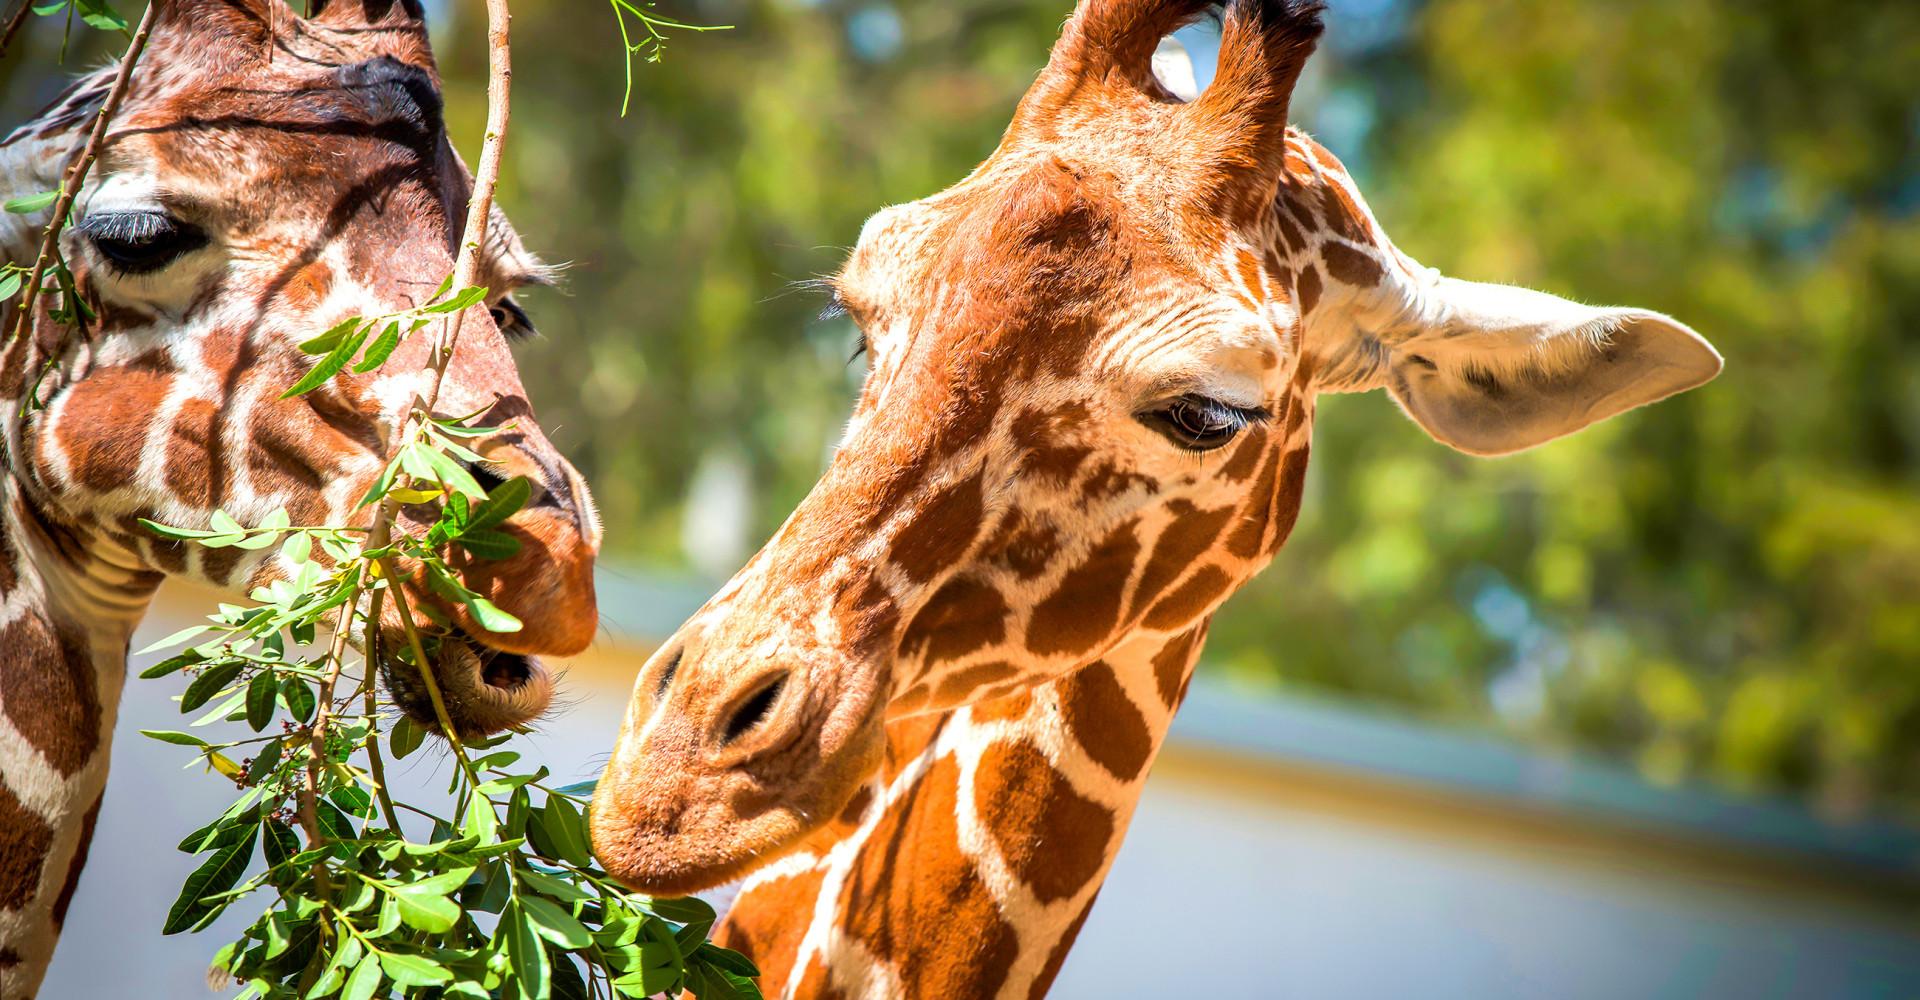 Wakker worden tussen de giraffen